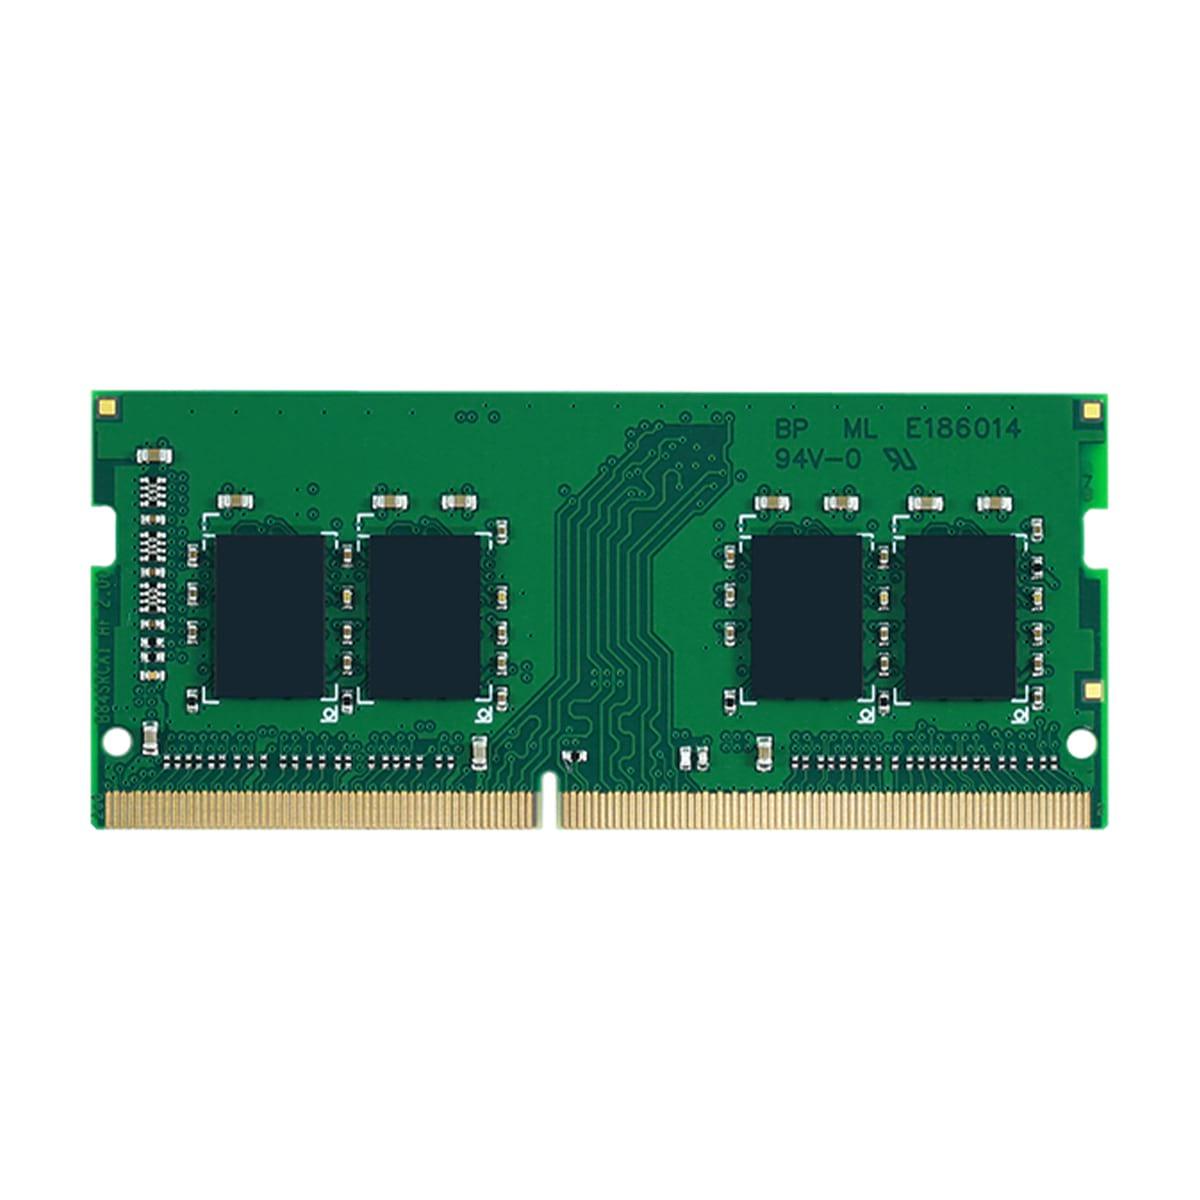 8GB DDR4-2666 PC4-21300 ECC Unbuffered 260 Pin 1.2V  CL19 Memory